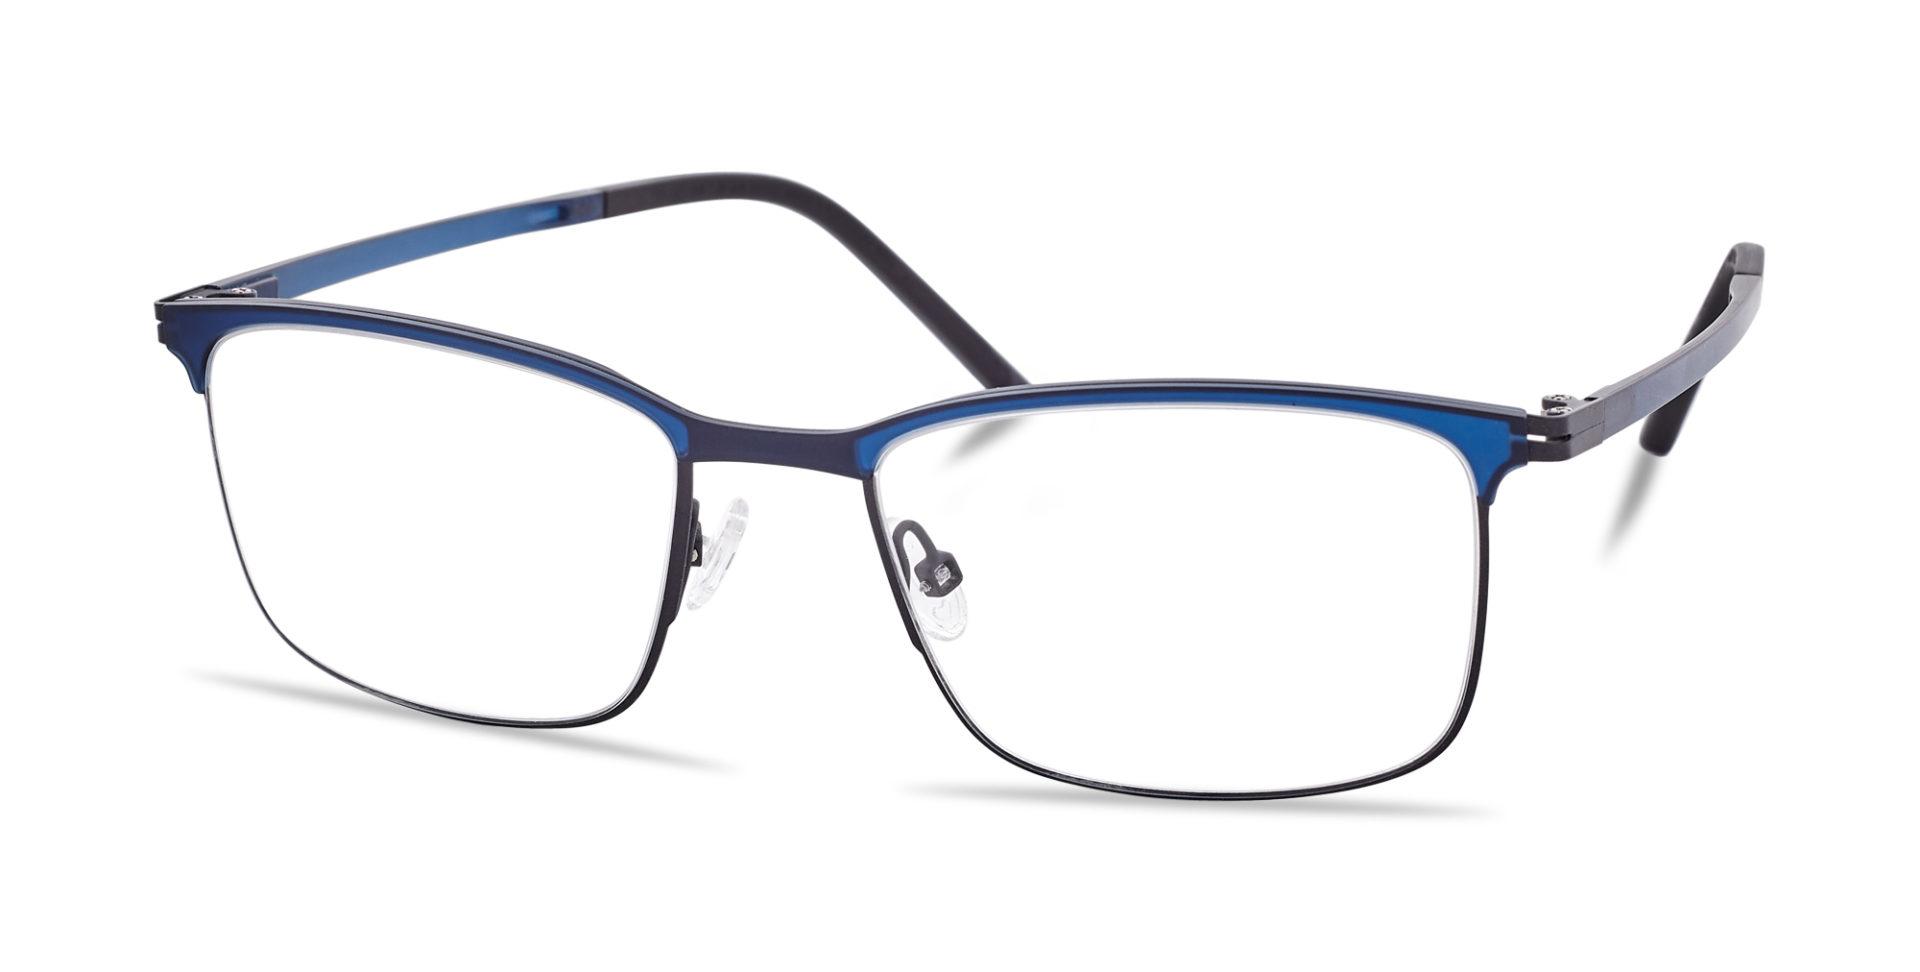 imago brille in muenchen - Imago Spaxies